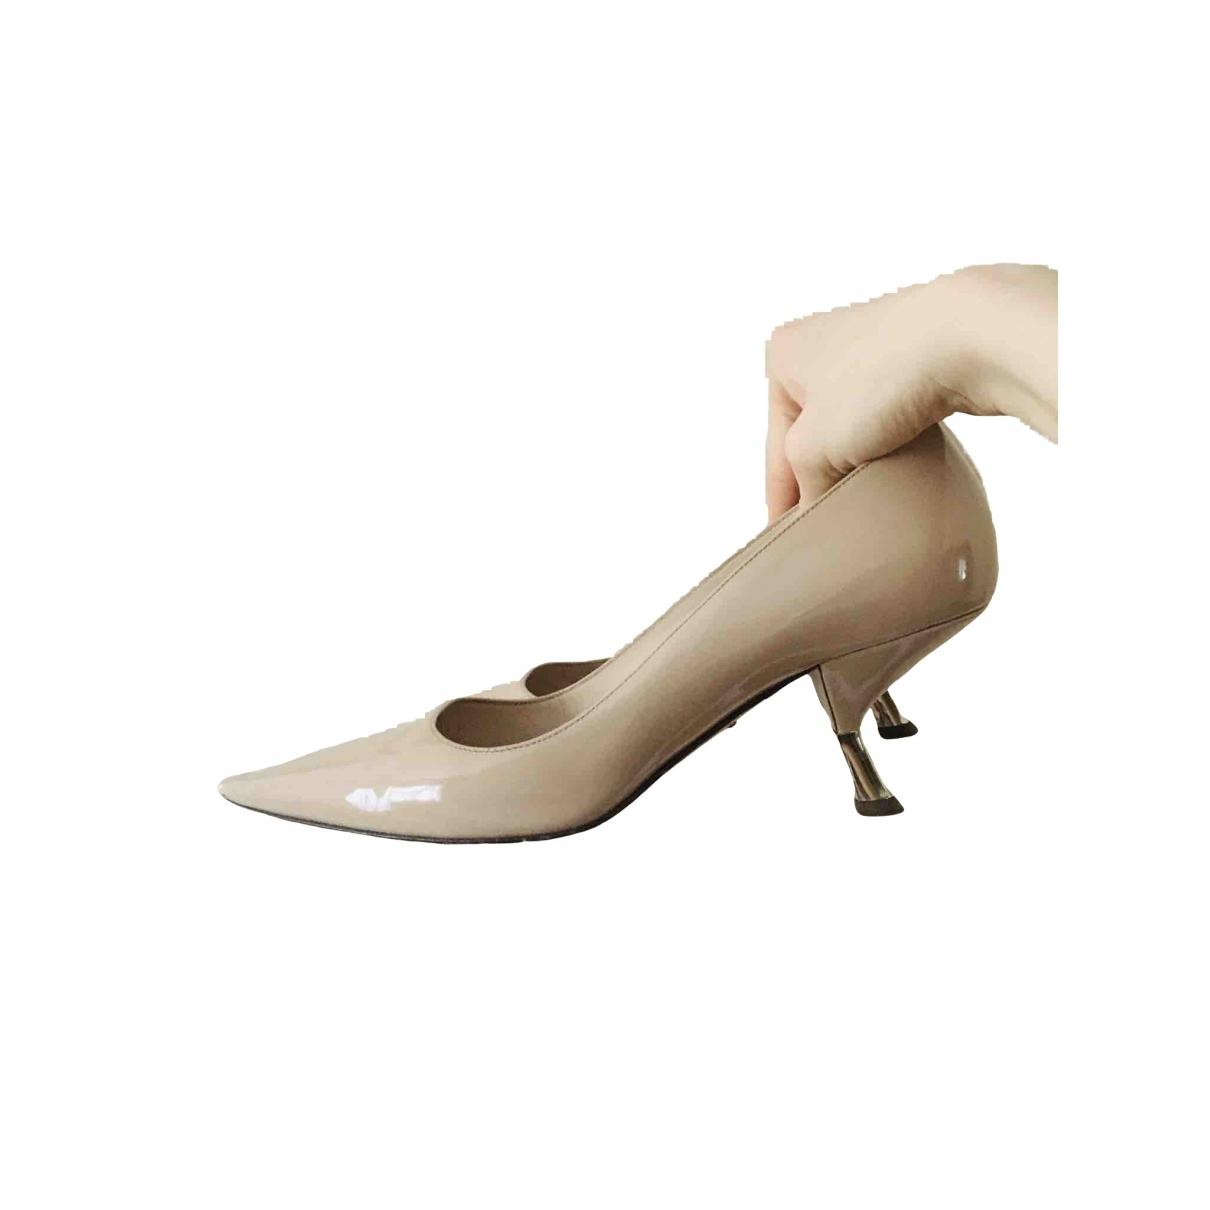 Prada \N Beige Patent leather Heels for Women 39 EU